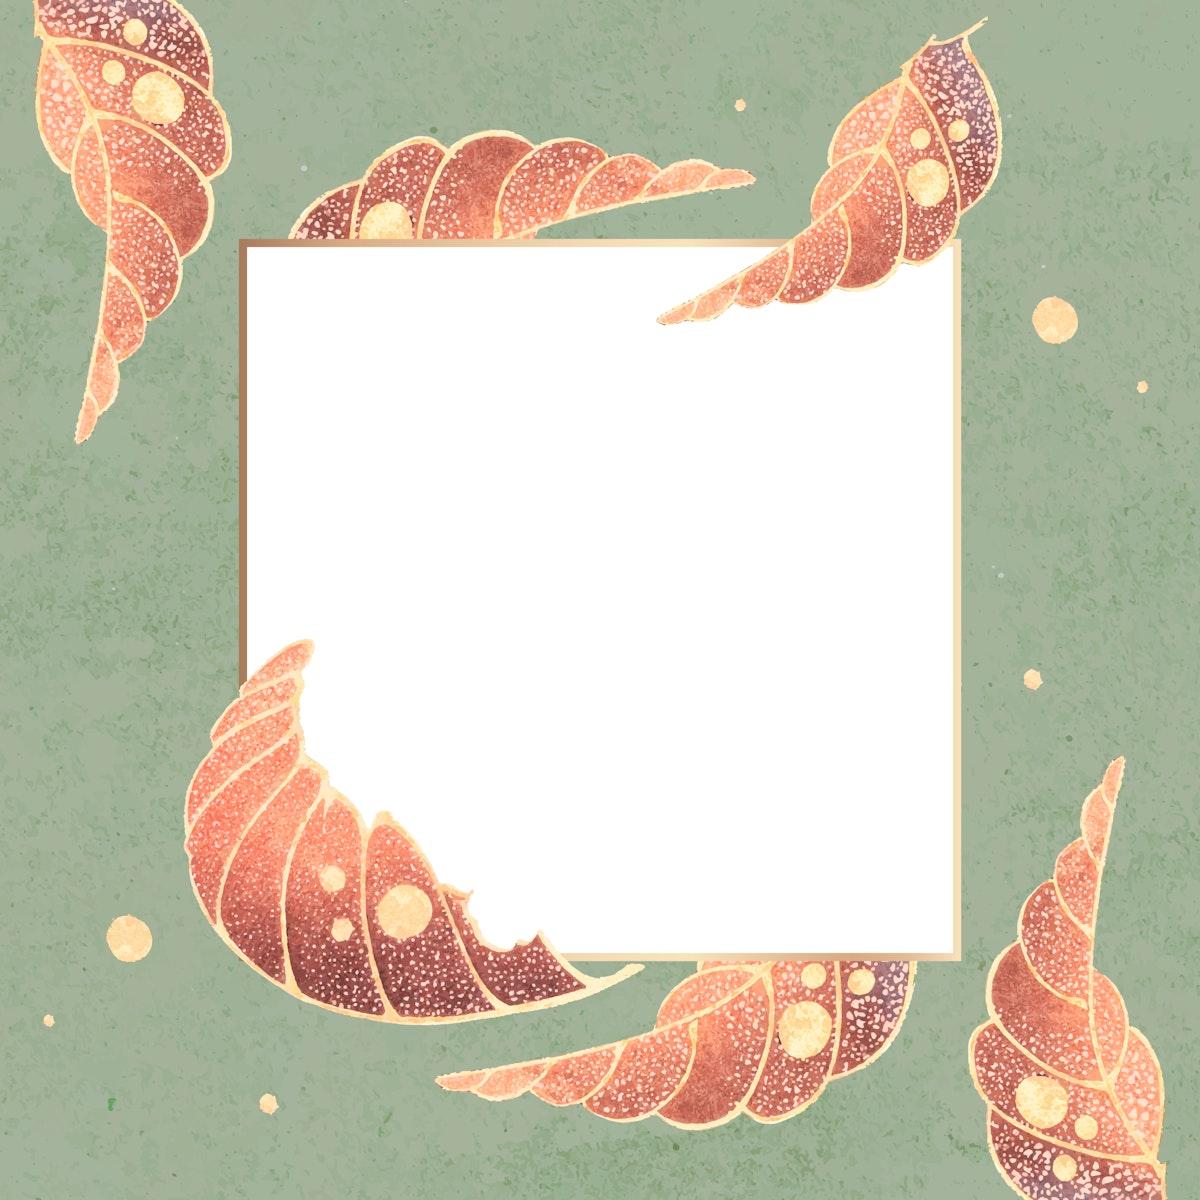 Gold square frame with vintage leaf motifs on an emerald background vector